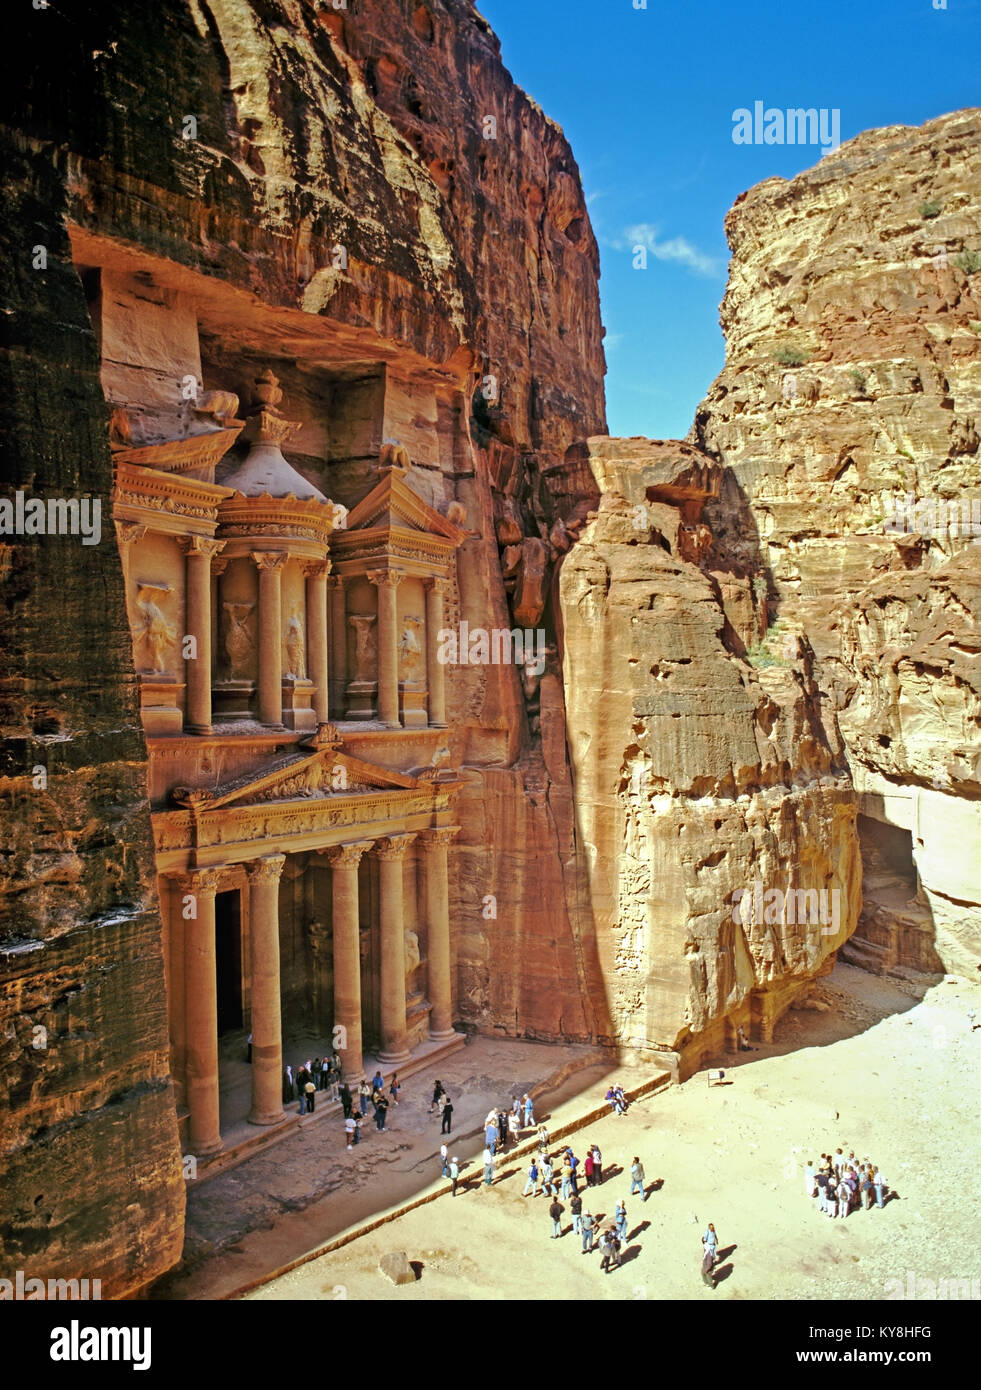 2235. The Khazneh (Treasury), Petra, Ma'an Gov, Jordan Stock Photo